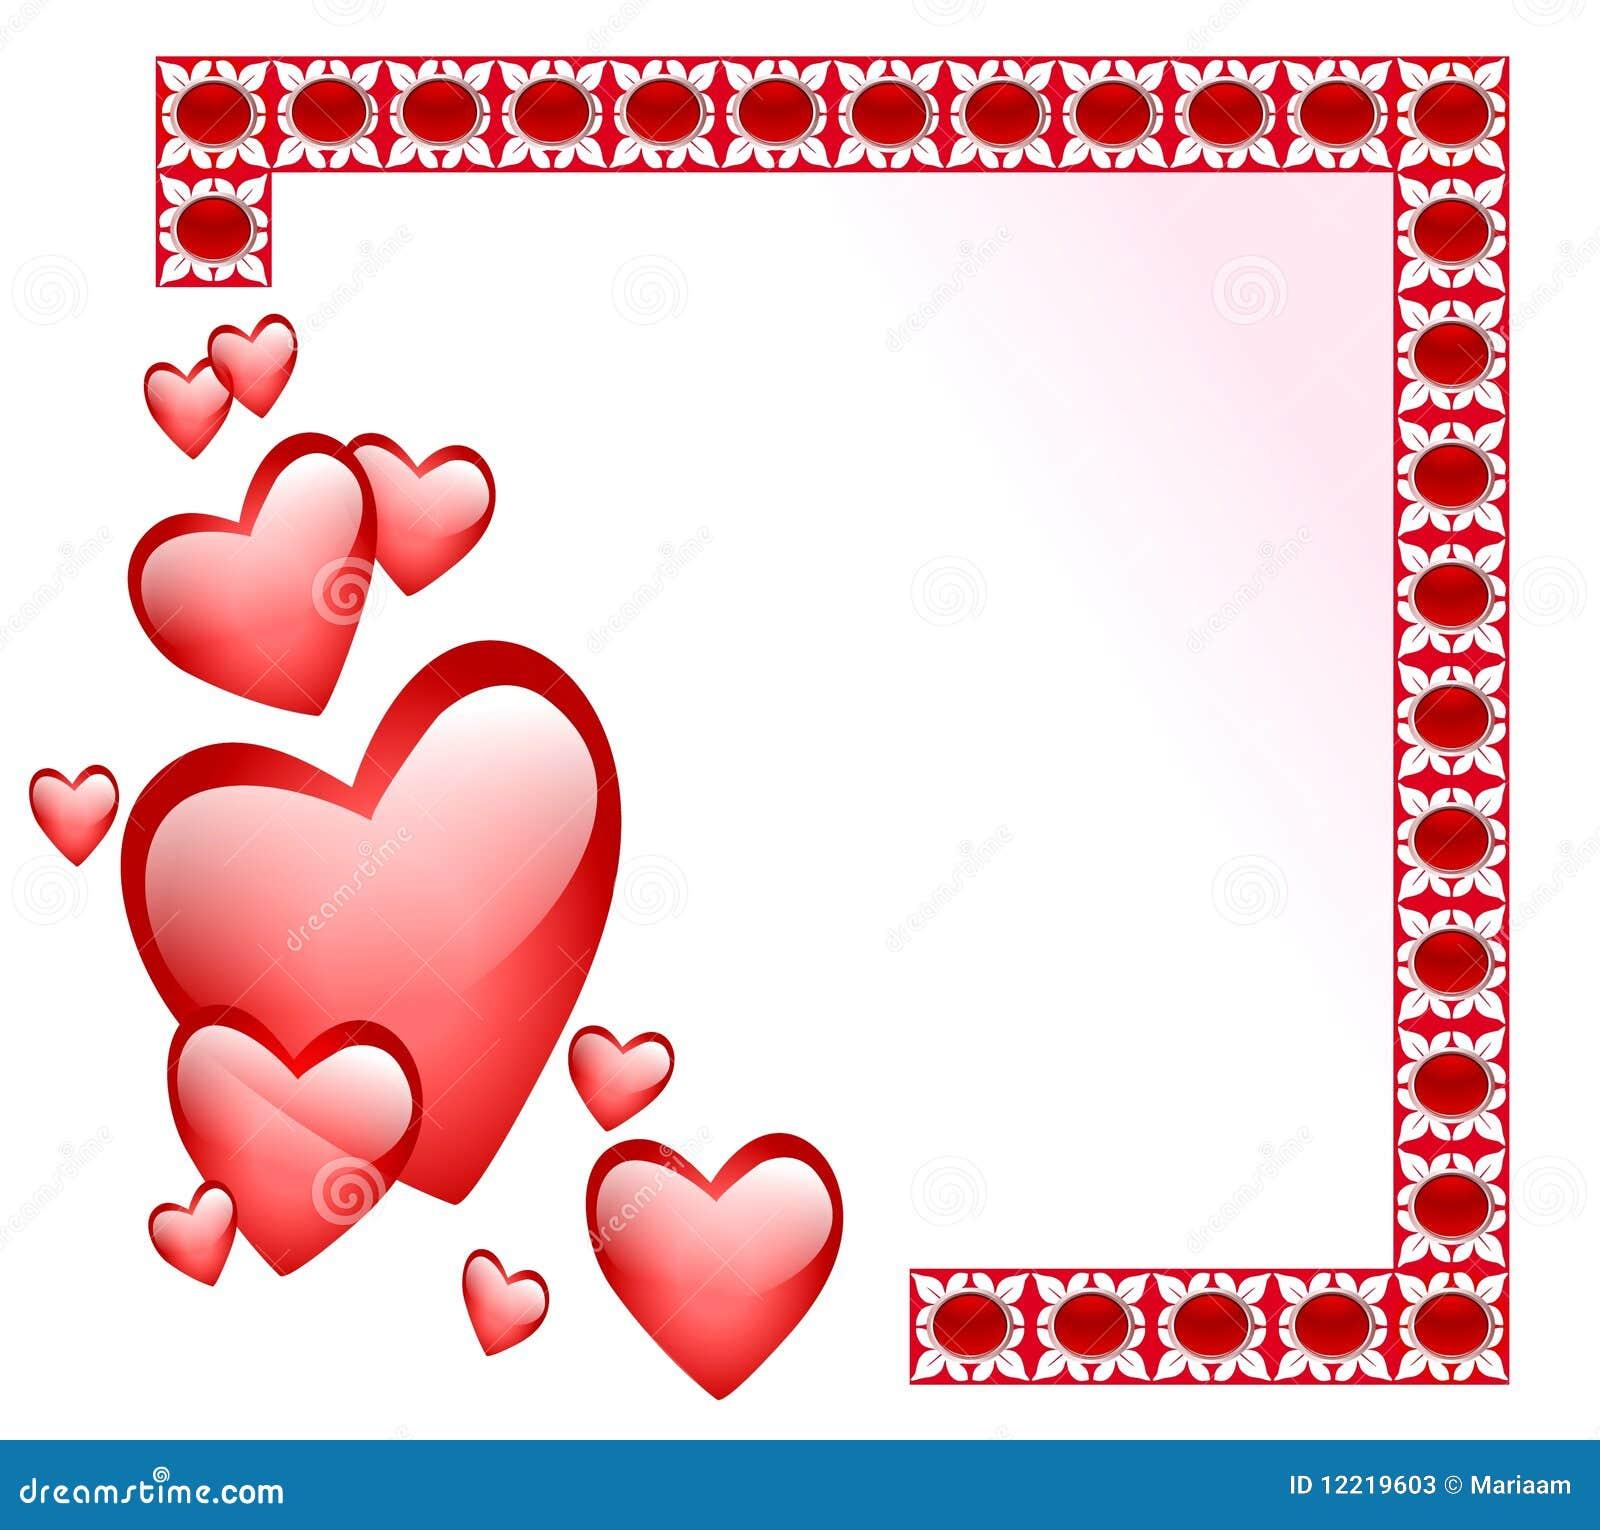 Top descargar photoscape gratis images for pinterest tattoos - Marcos de corazones para fotos ...